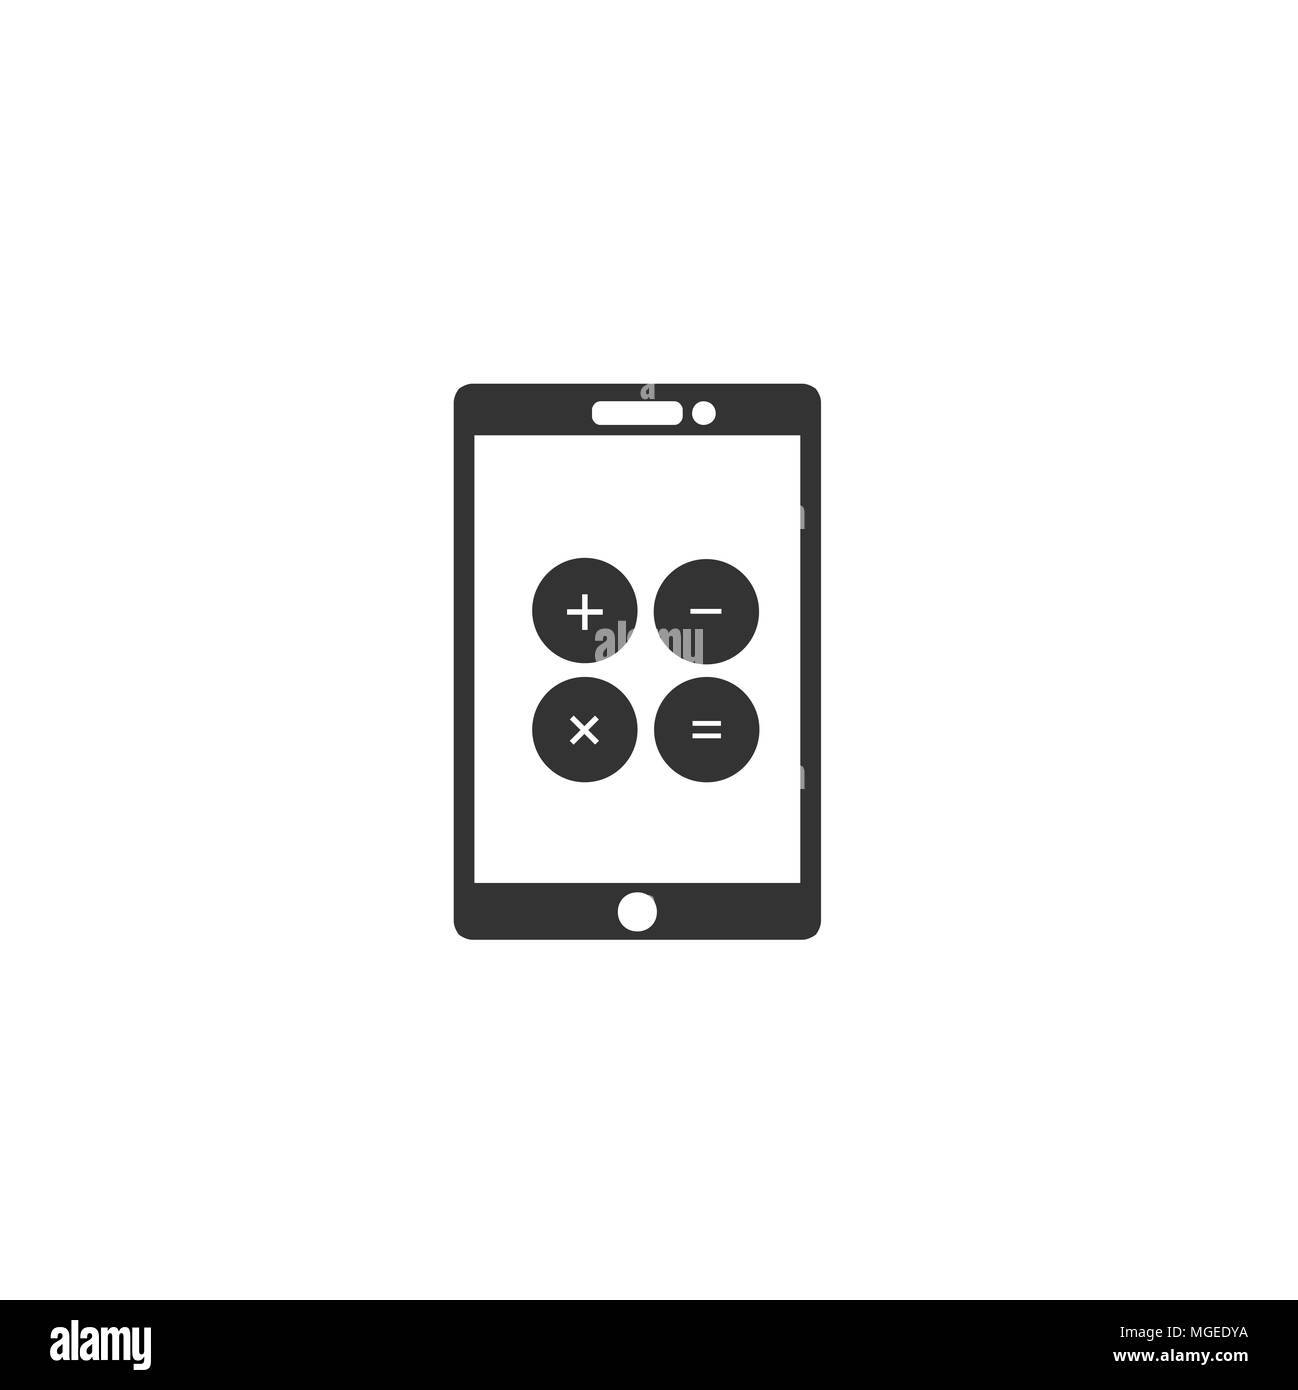 calculator app sign icon